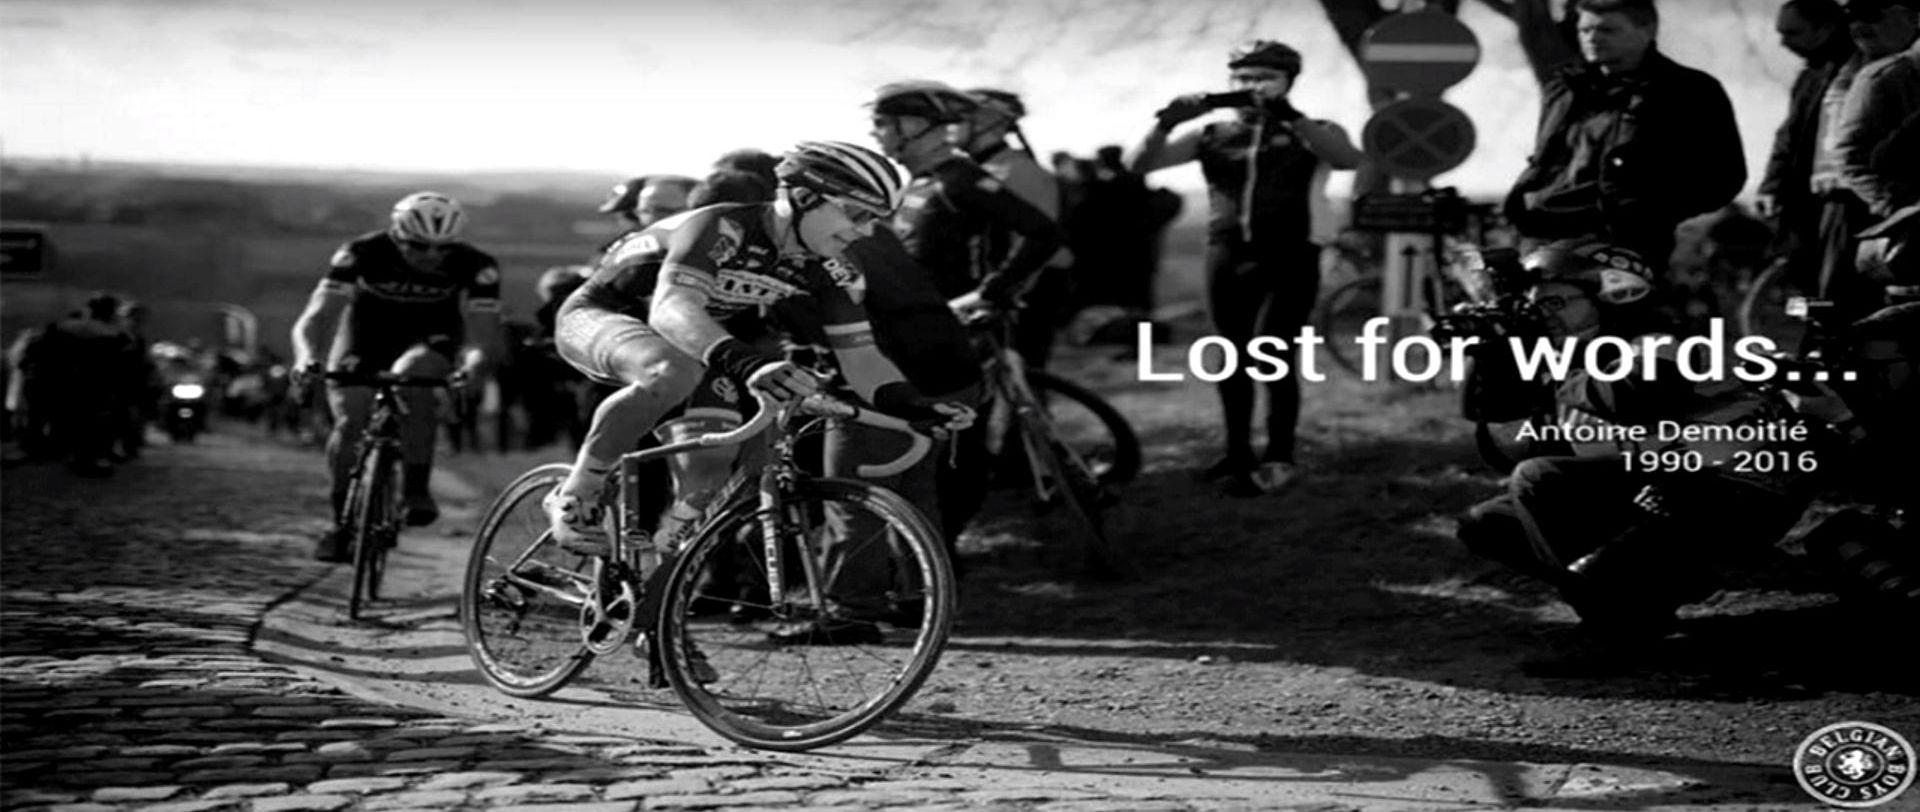 PREGAZIO GA MOTOCIKL TIJEKOM UTRKE Preminuo biciklist Antoine Demoitie